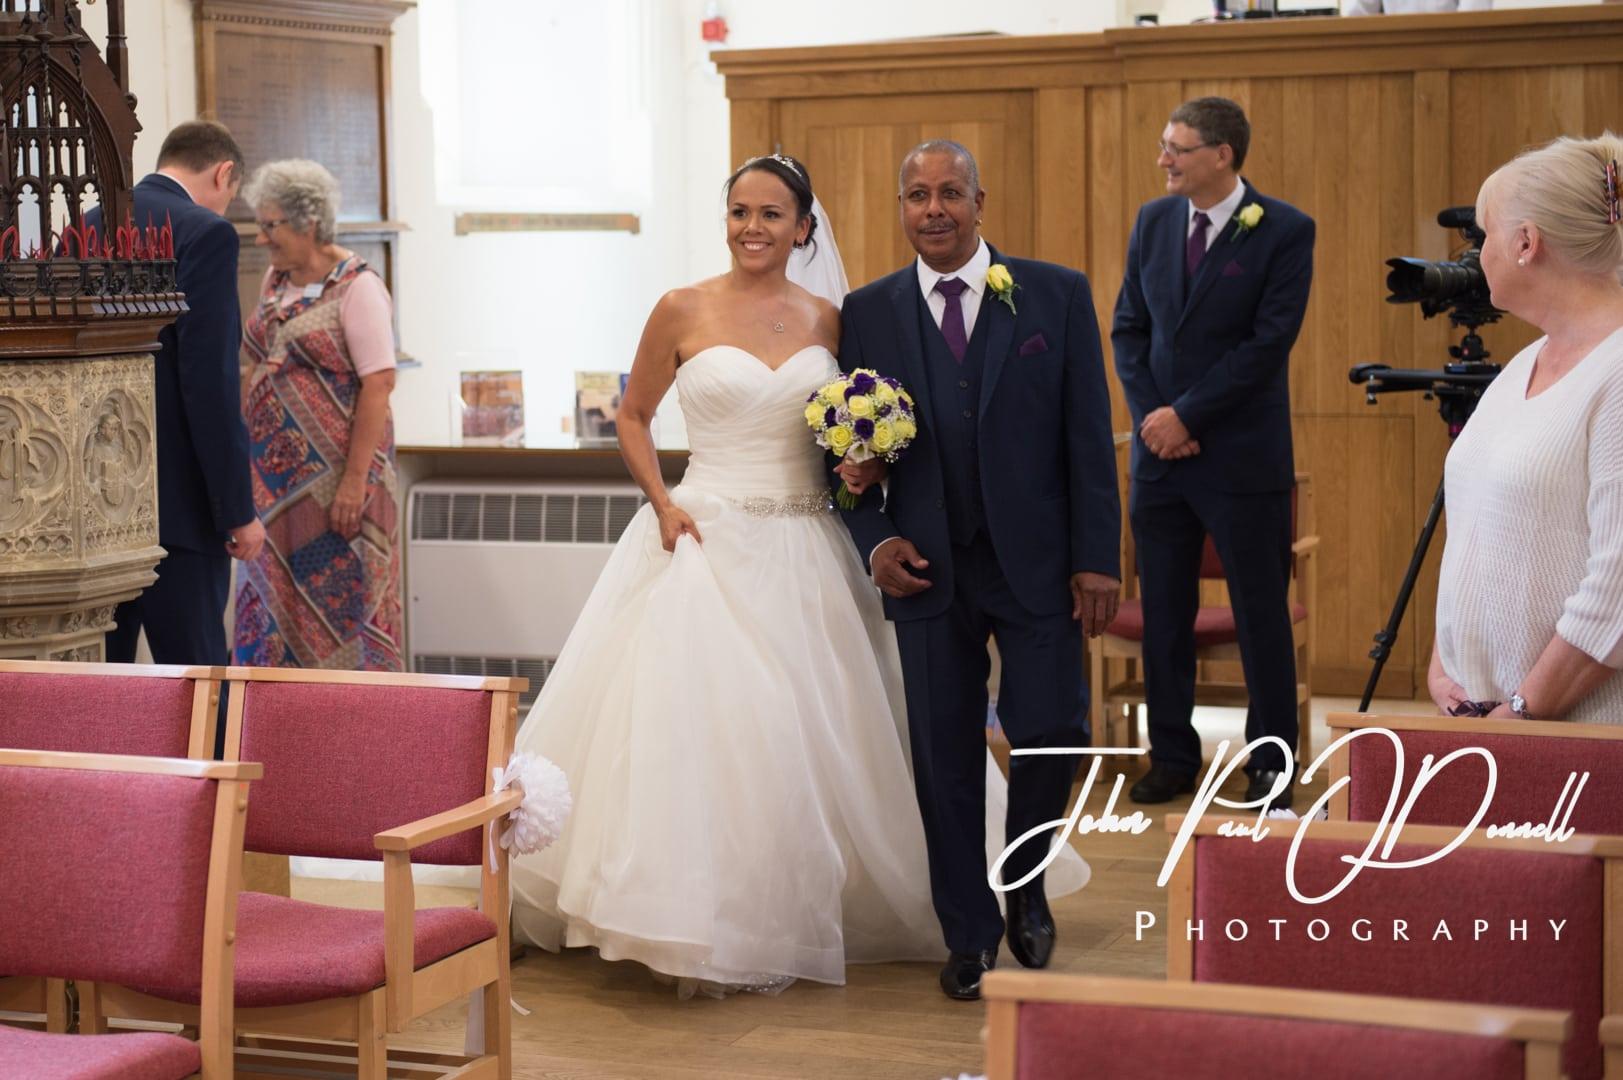 Manor of Groves - wedding of Bonita and Keith